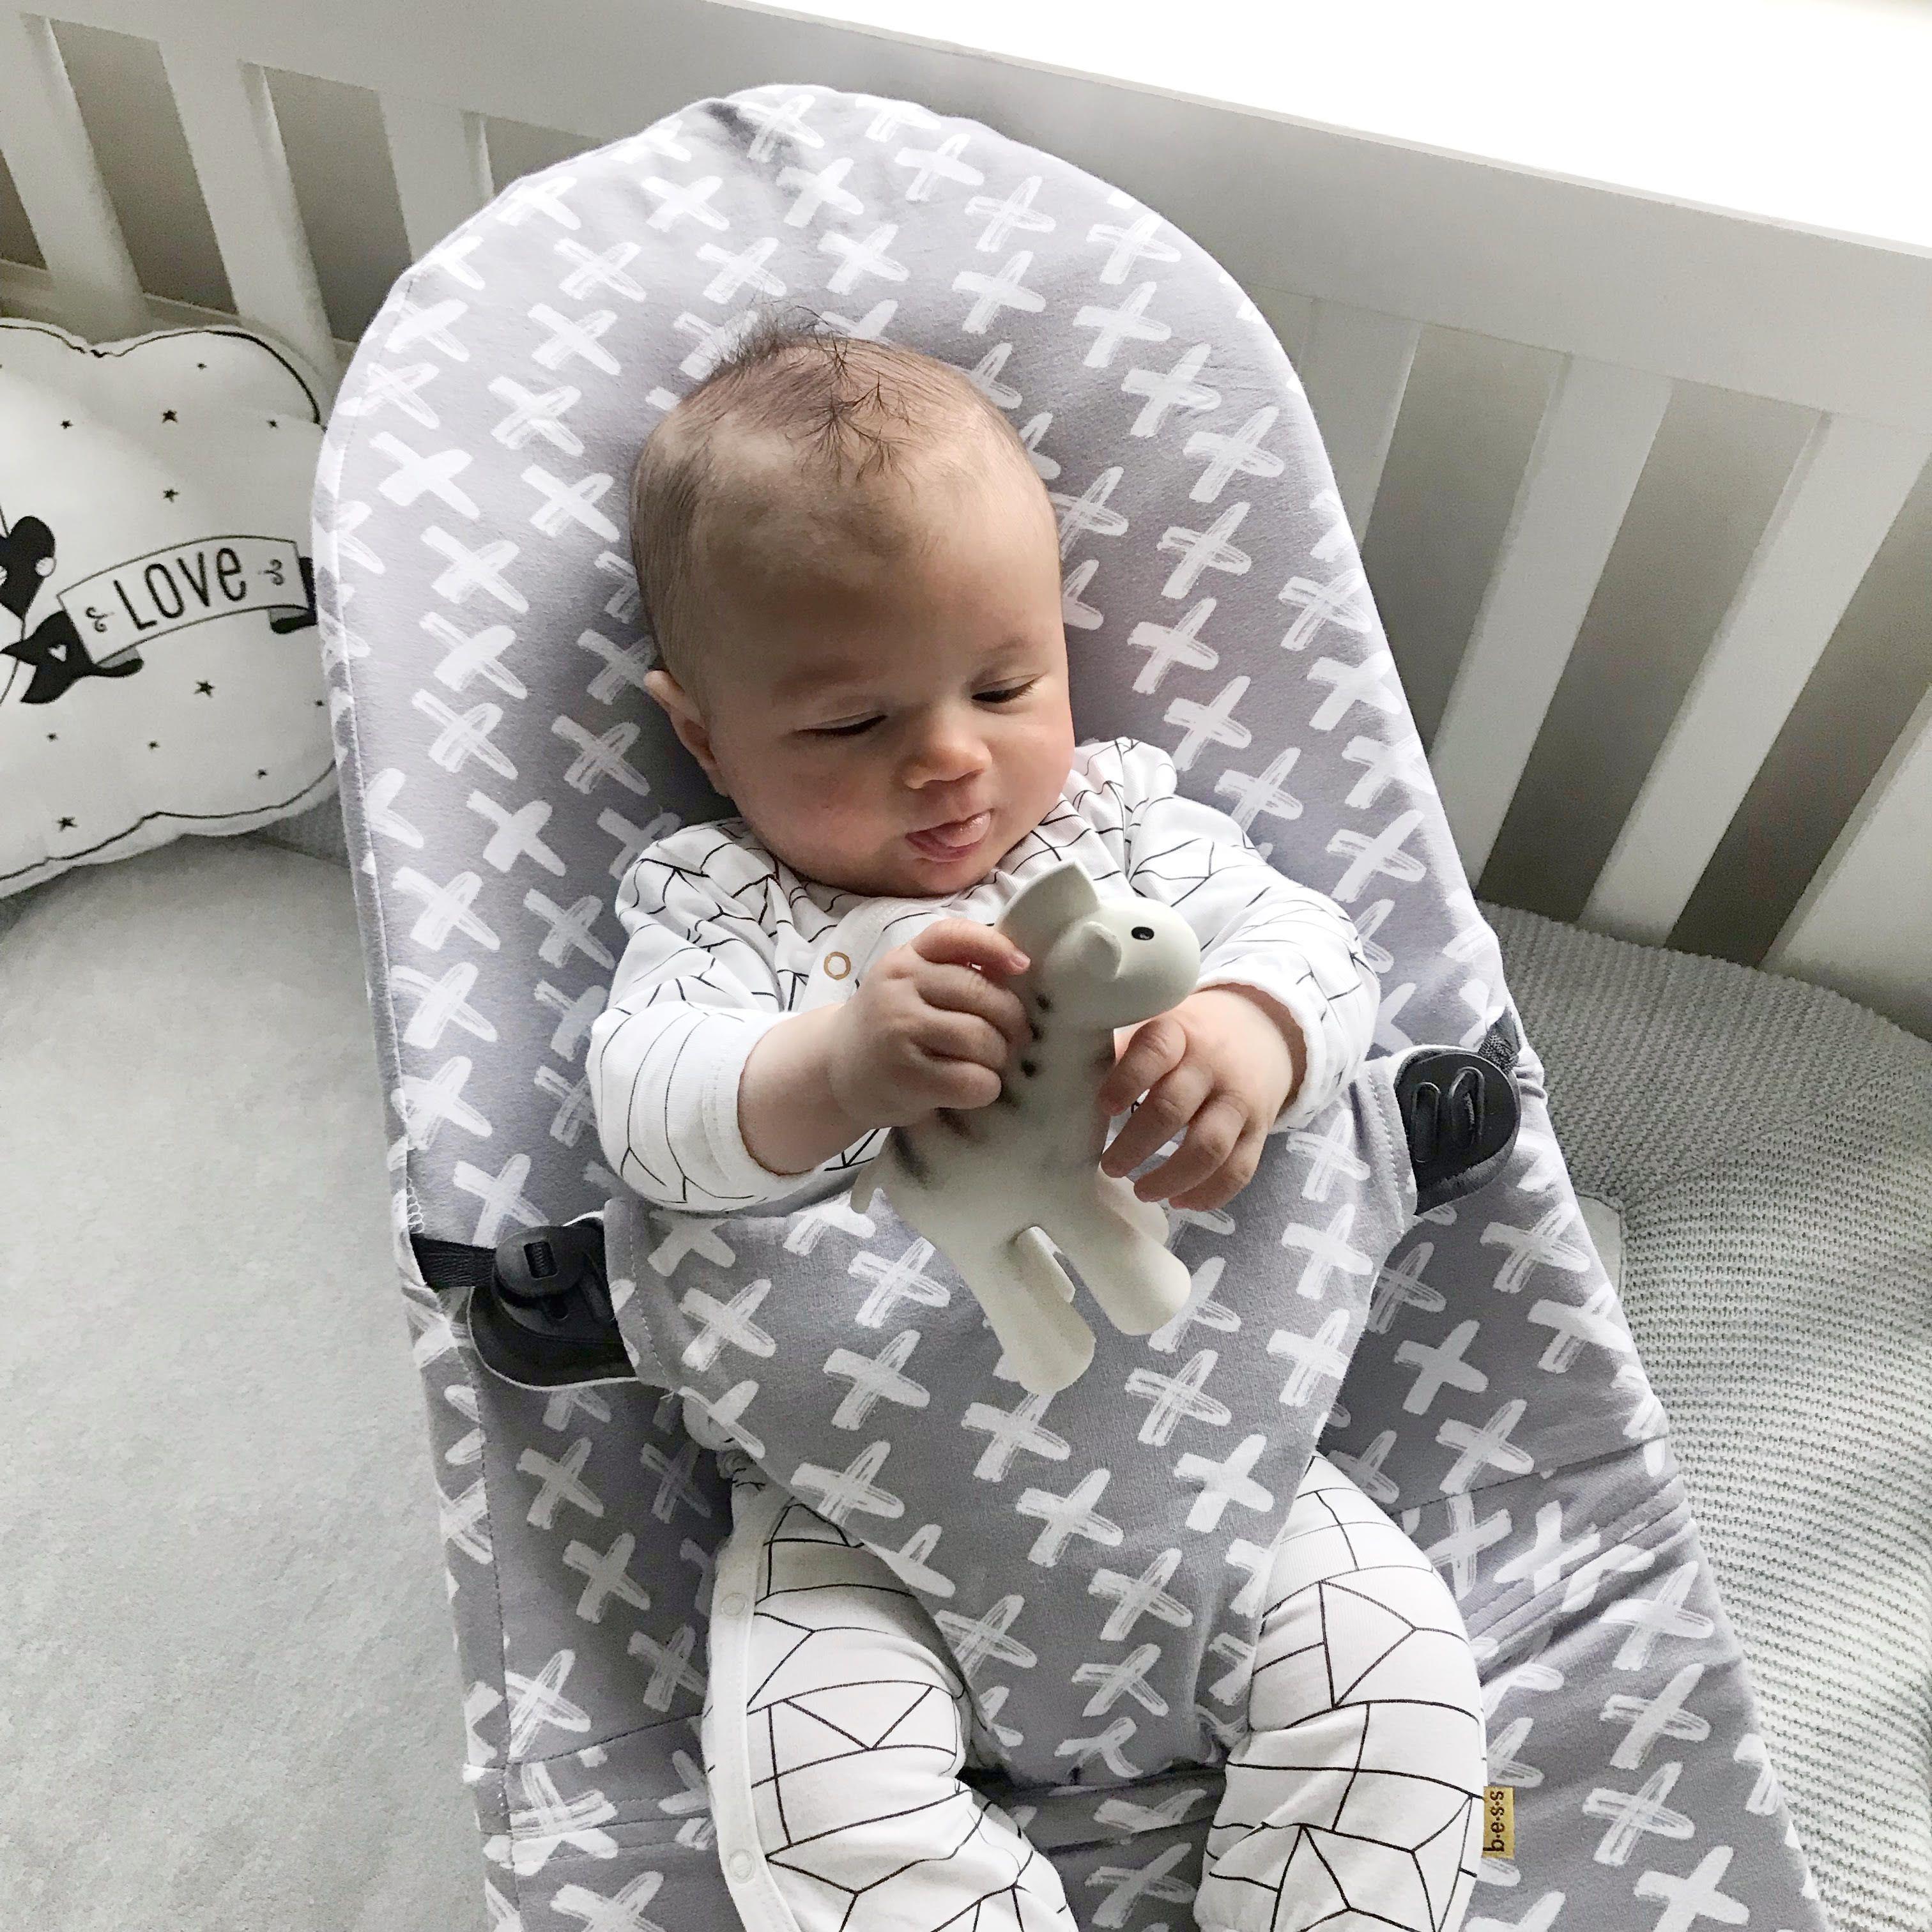 Babybjorn Bezug Grau Kreuze Letzte Stucke Baby Bjorn Baby Wippe Wippe